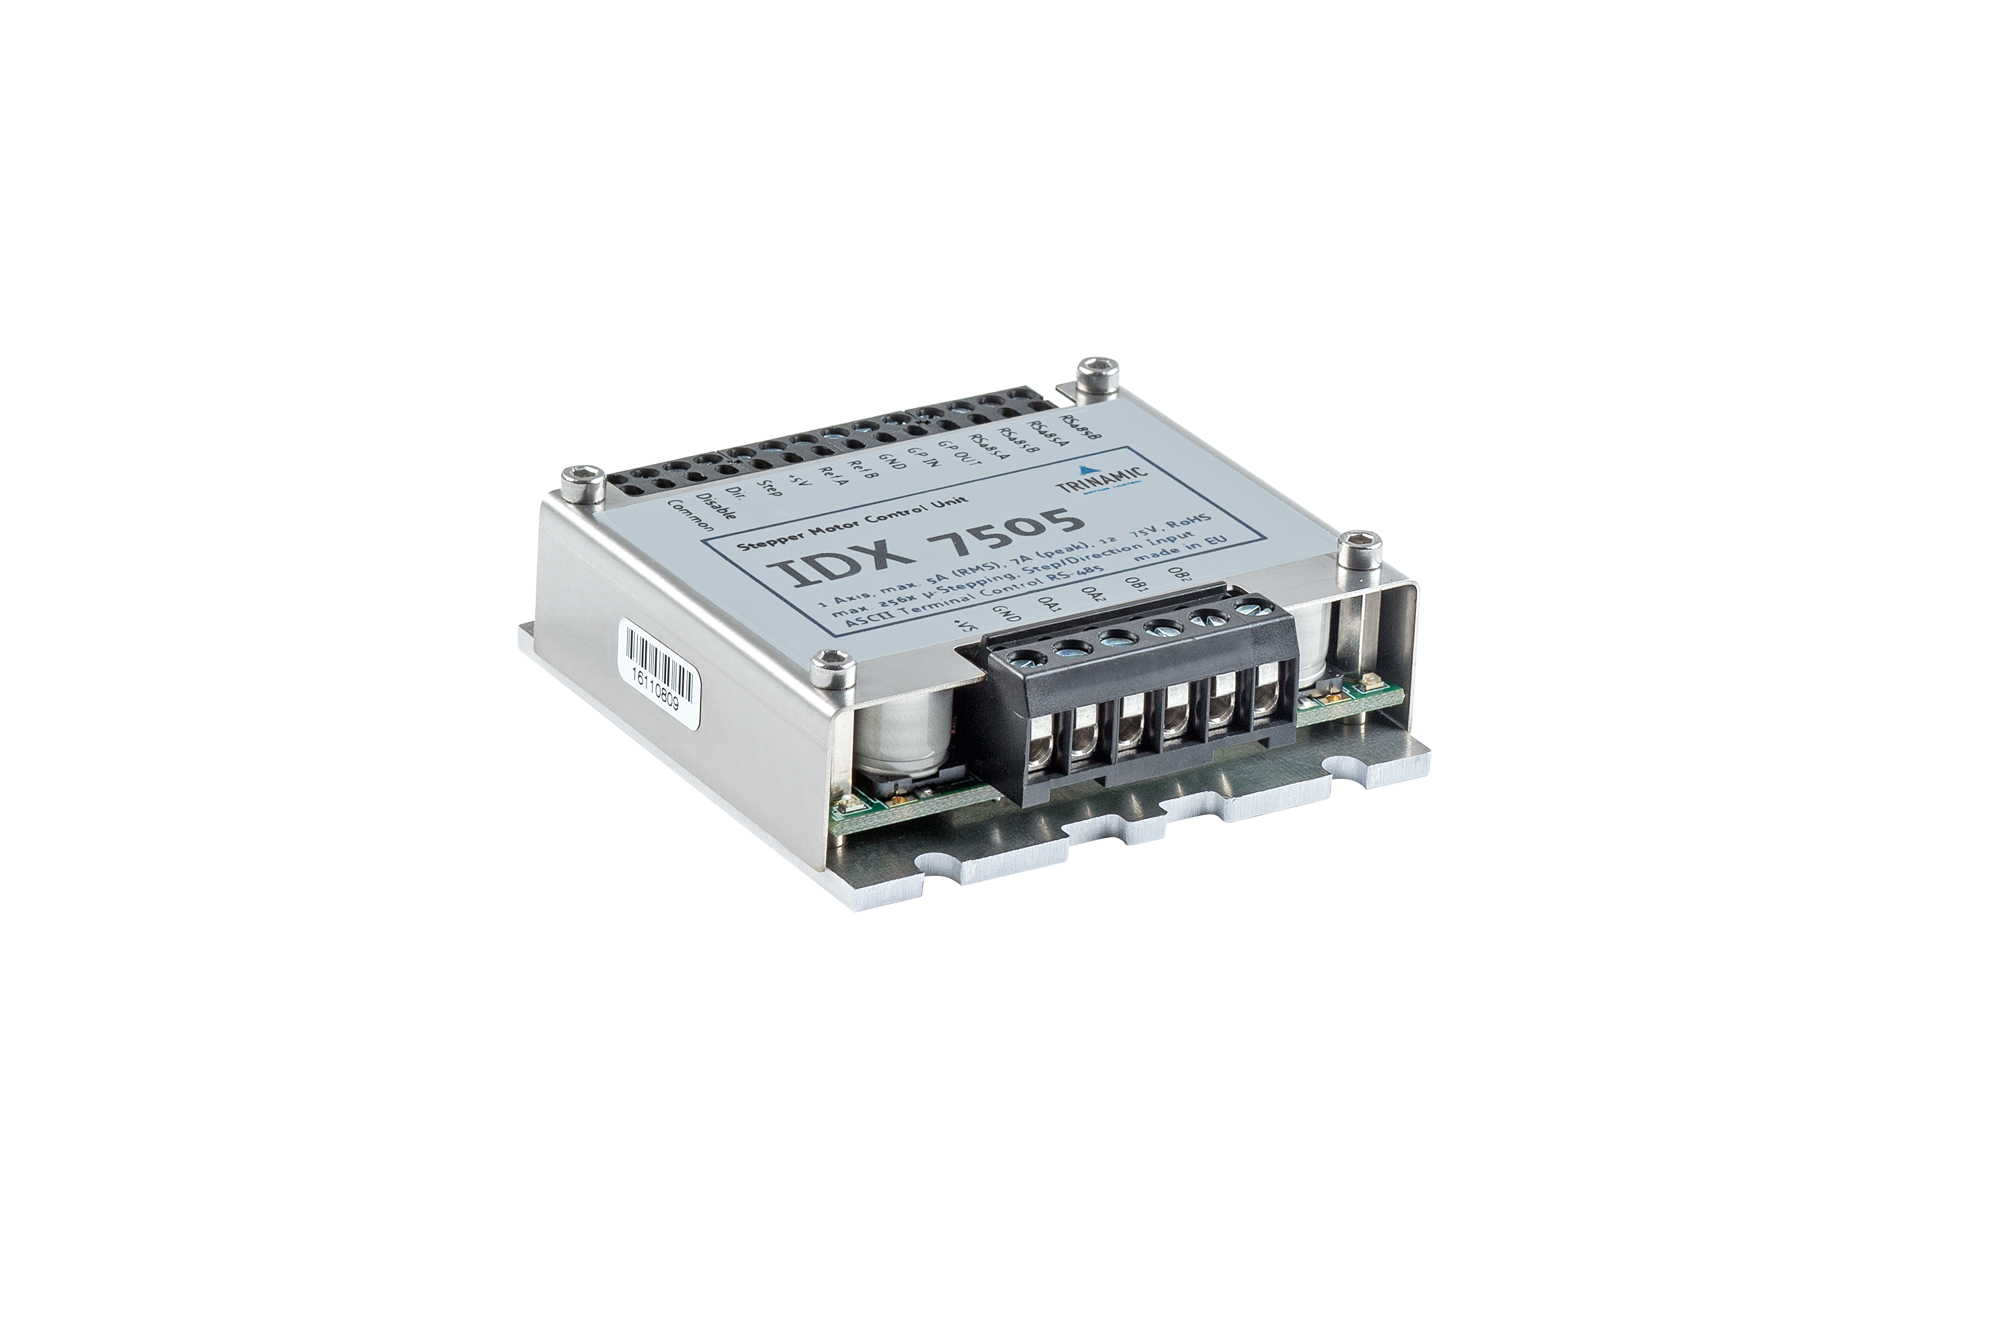 IDX 7505